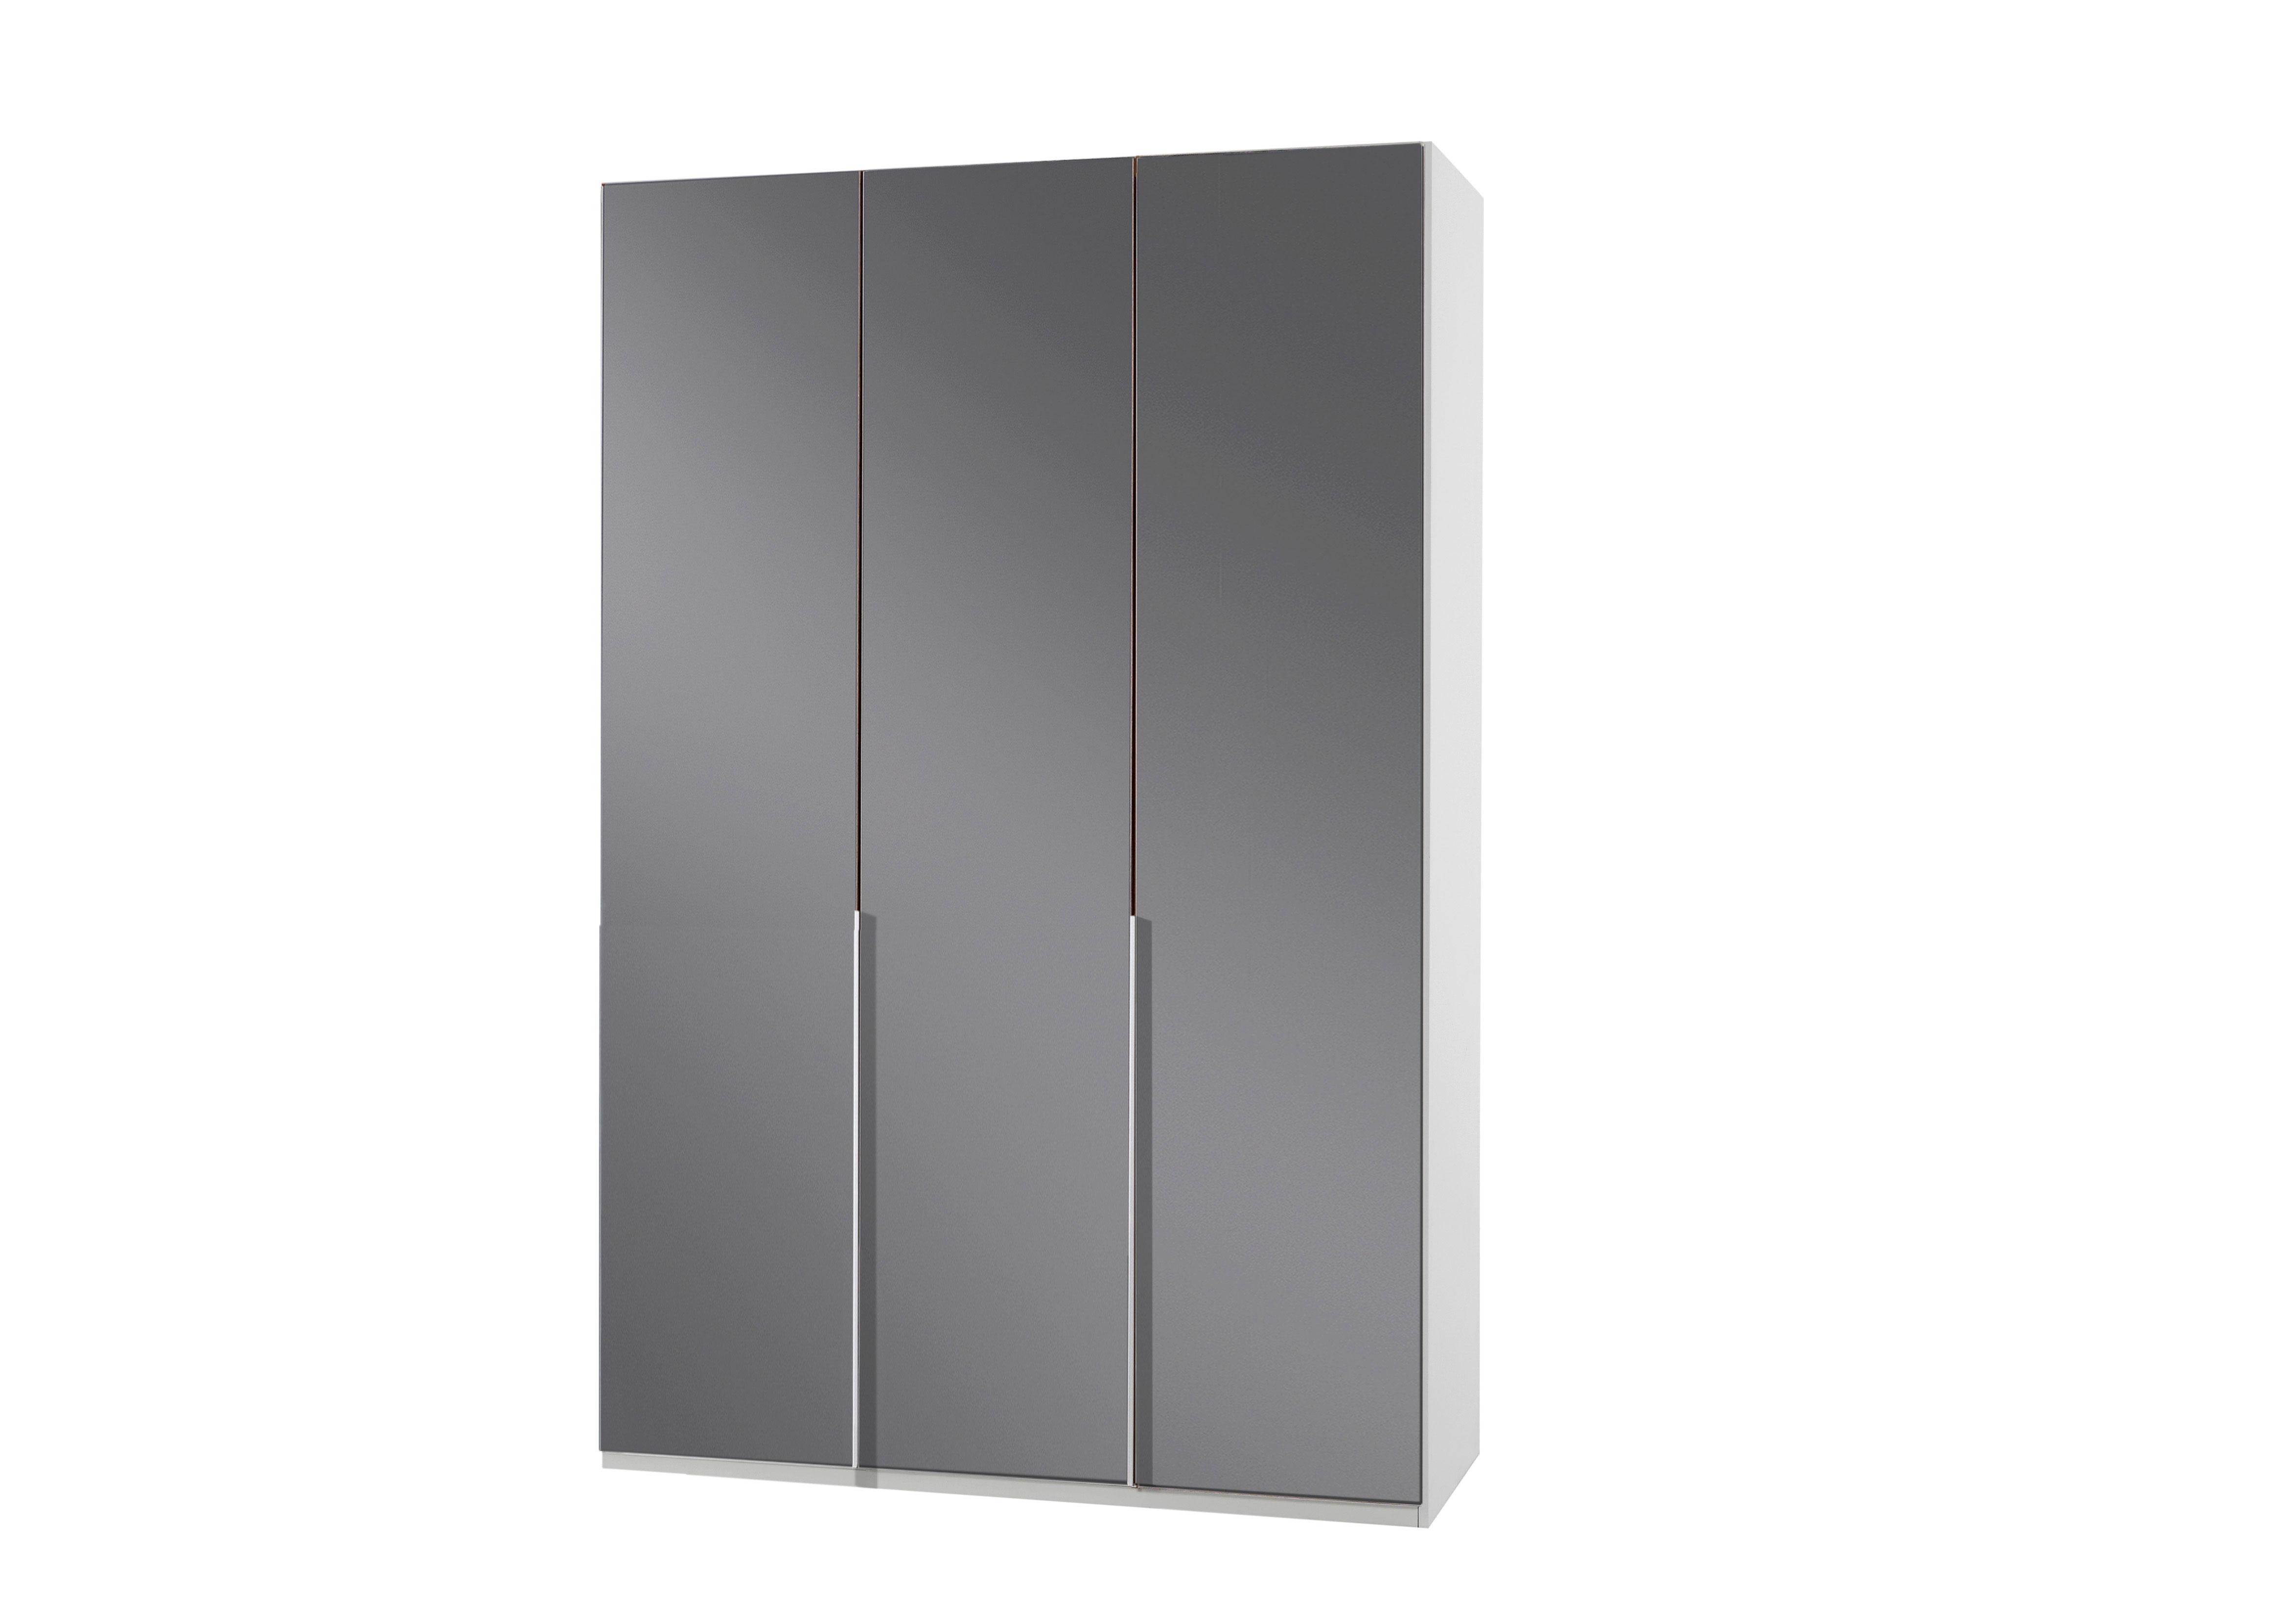 Armoire design 3 portes blanc alpin/verre gris Tony